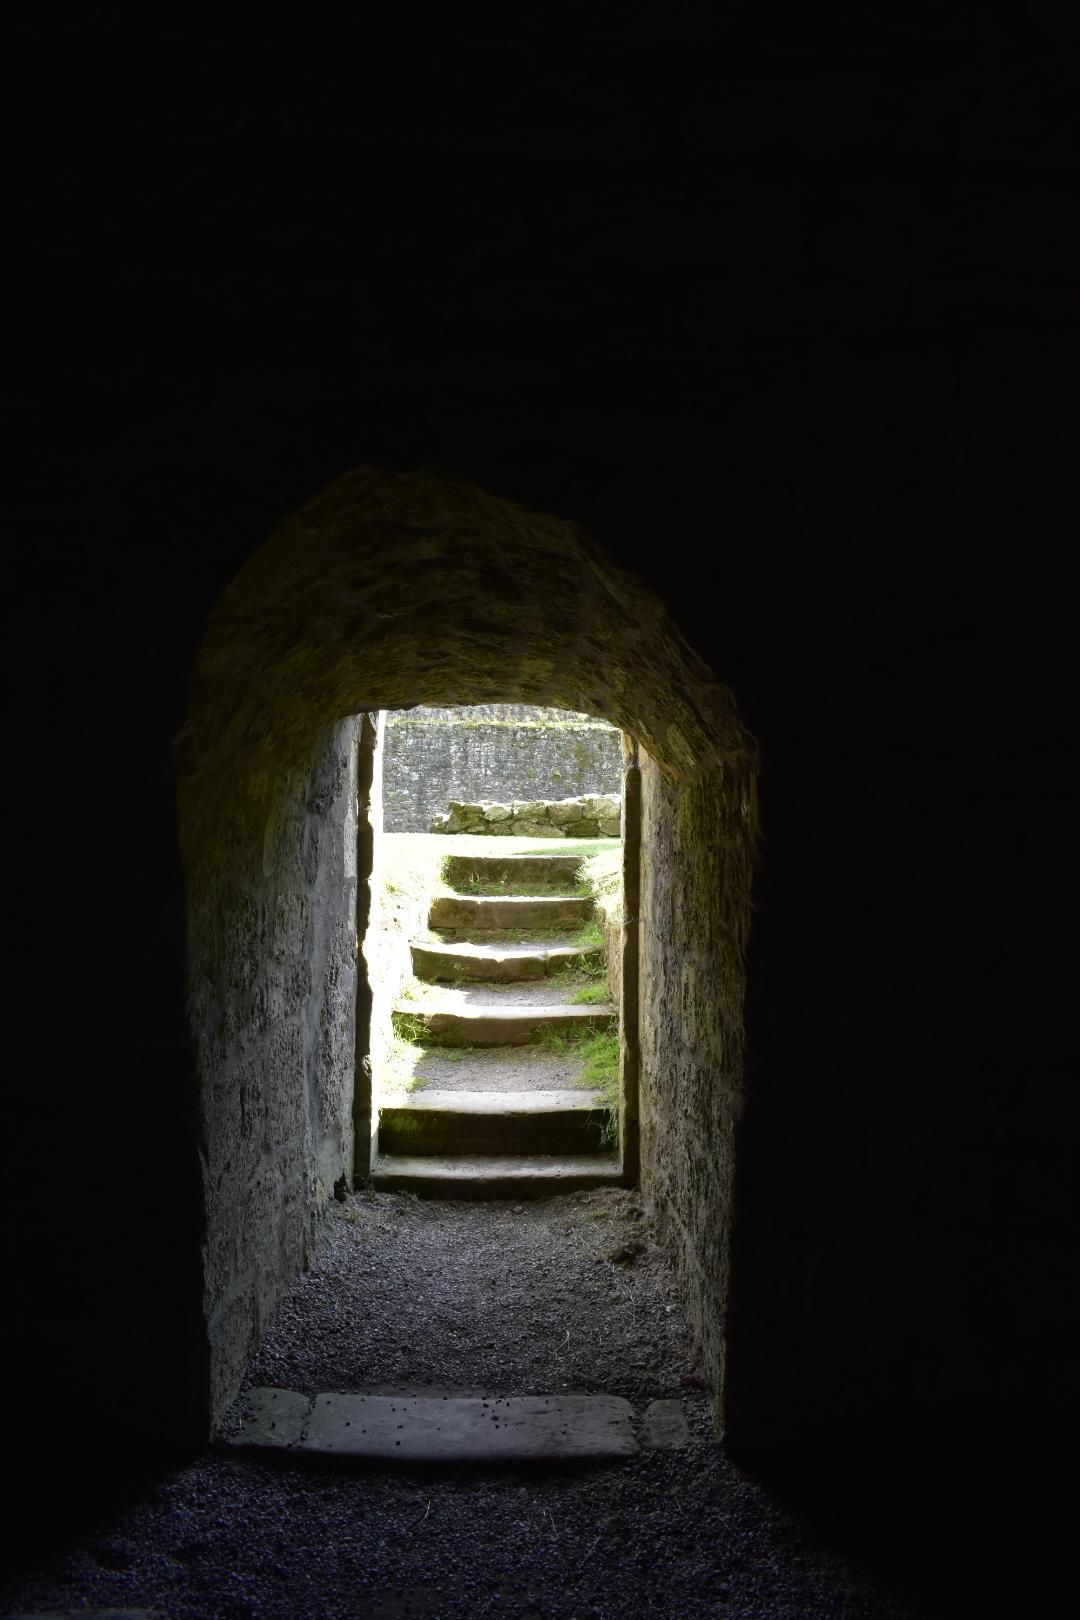 Lochleven Castle, Kinross, Scotland - 2018